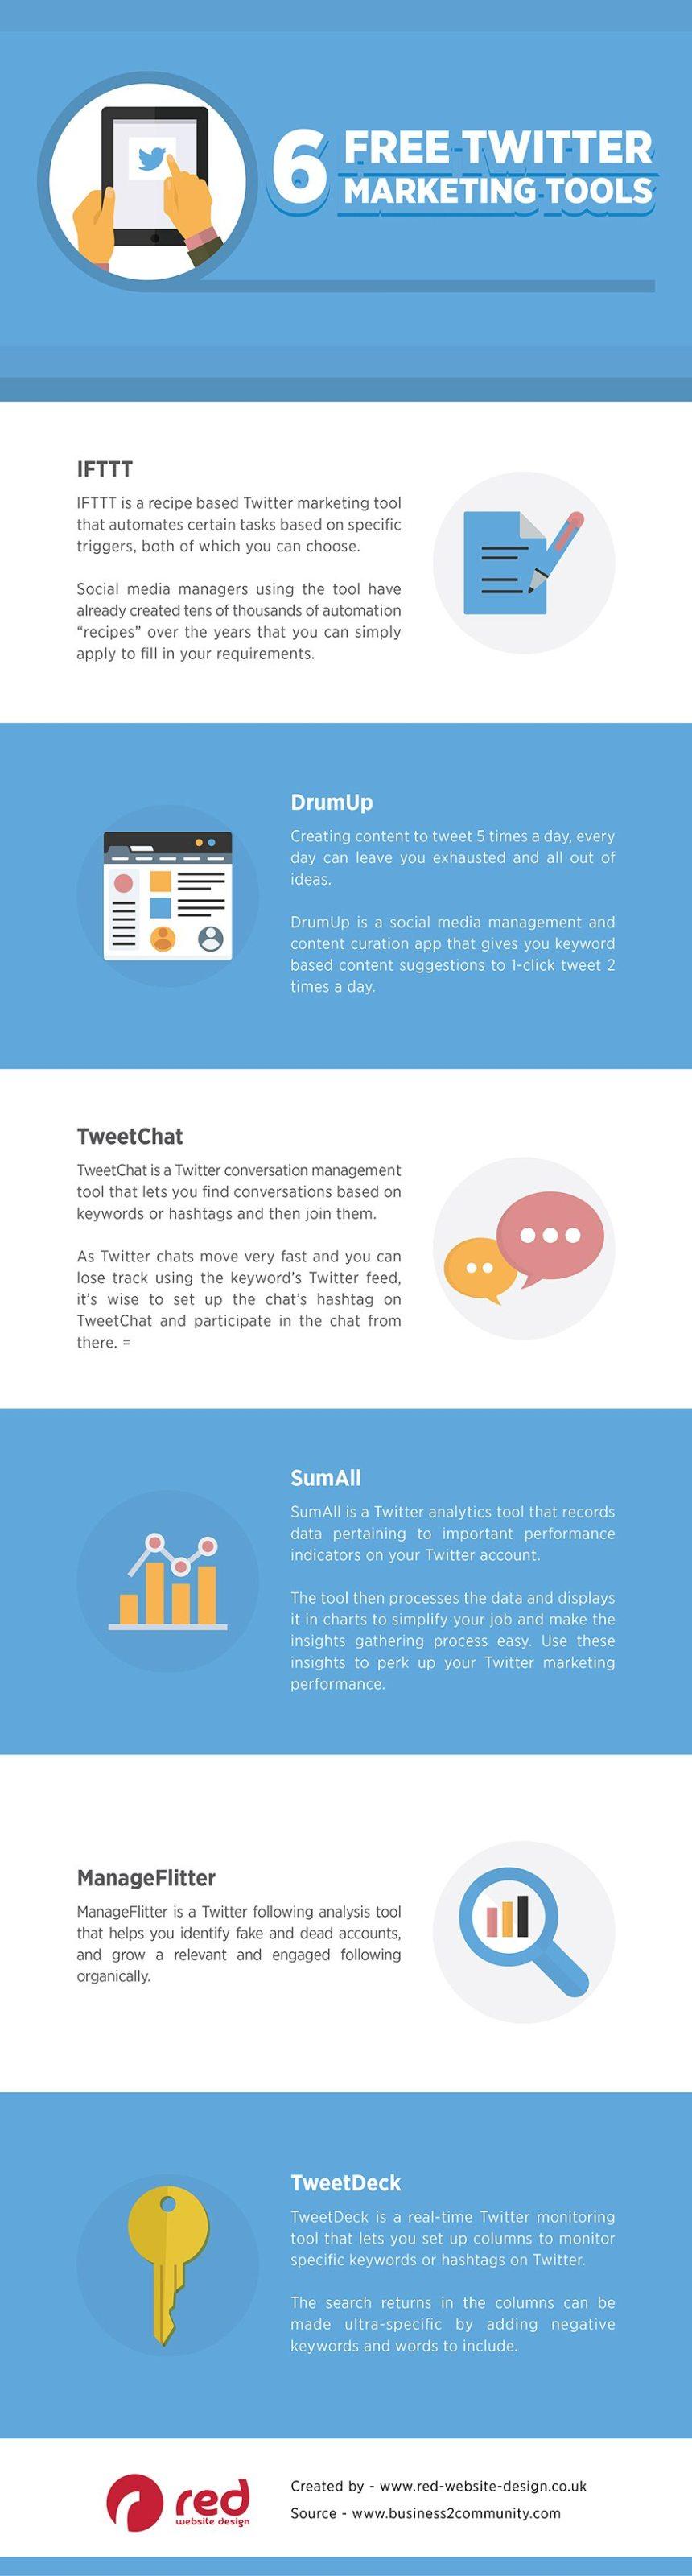 6 herramientas gratuitas para marketing en Twitter